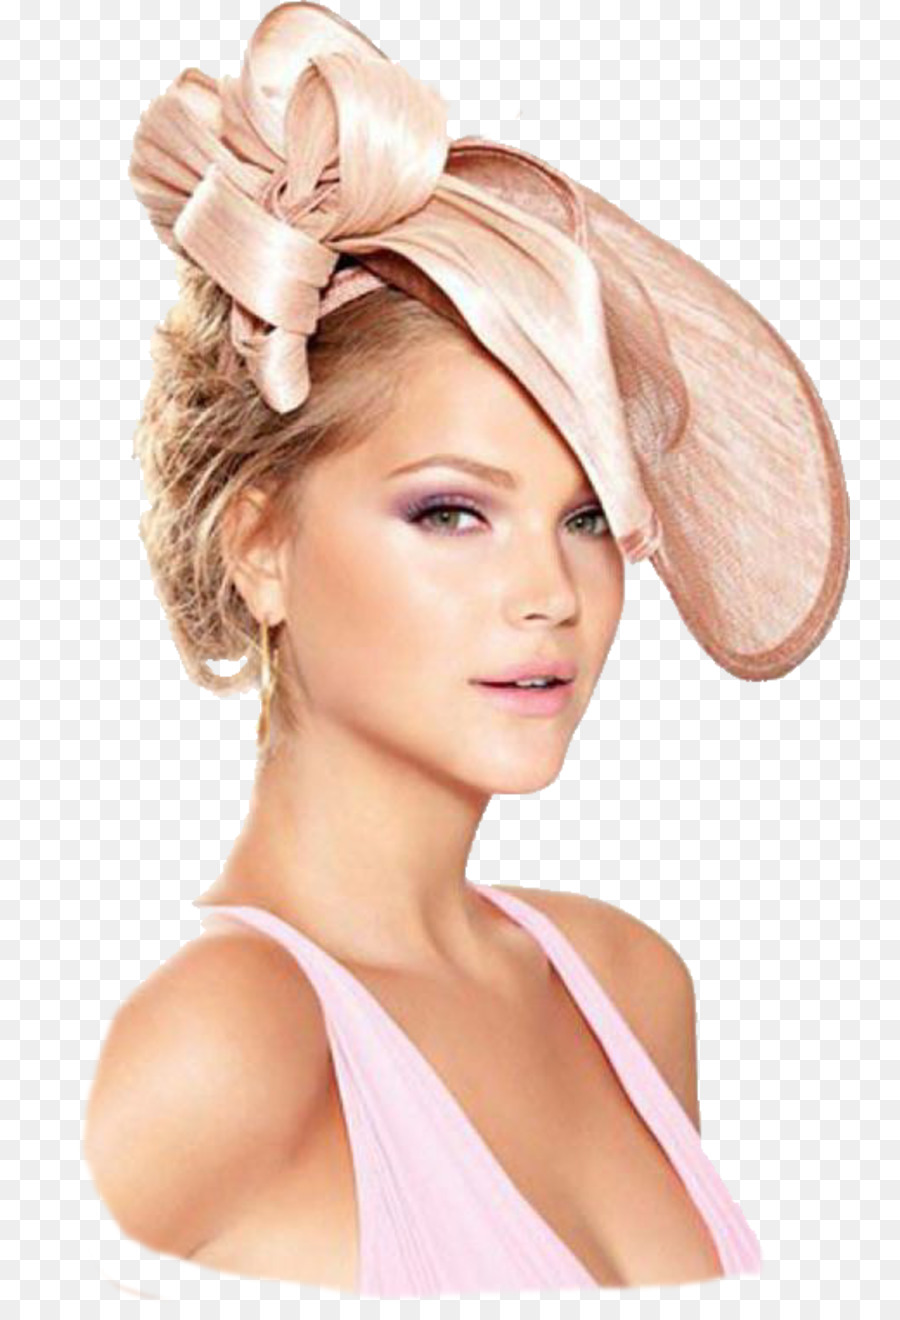 b79645fddce Esti Ginzburg Bowler hat Model Headgear - Hat png download - 800 1310 - Free  Transparent Esti Ginzburg png Download.